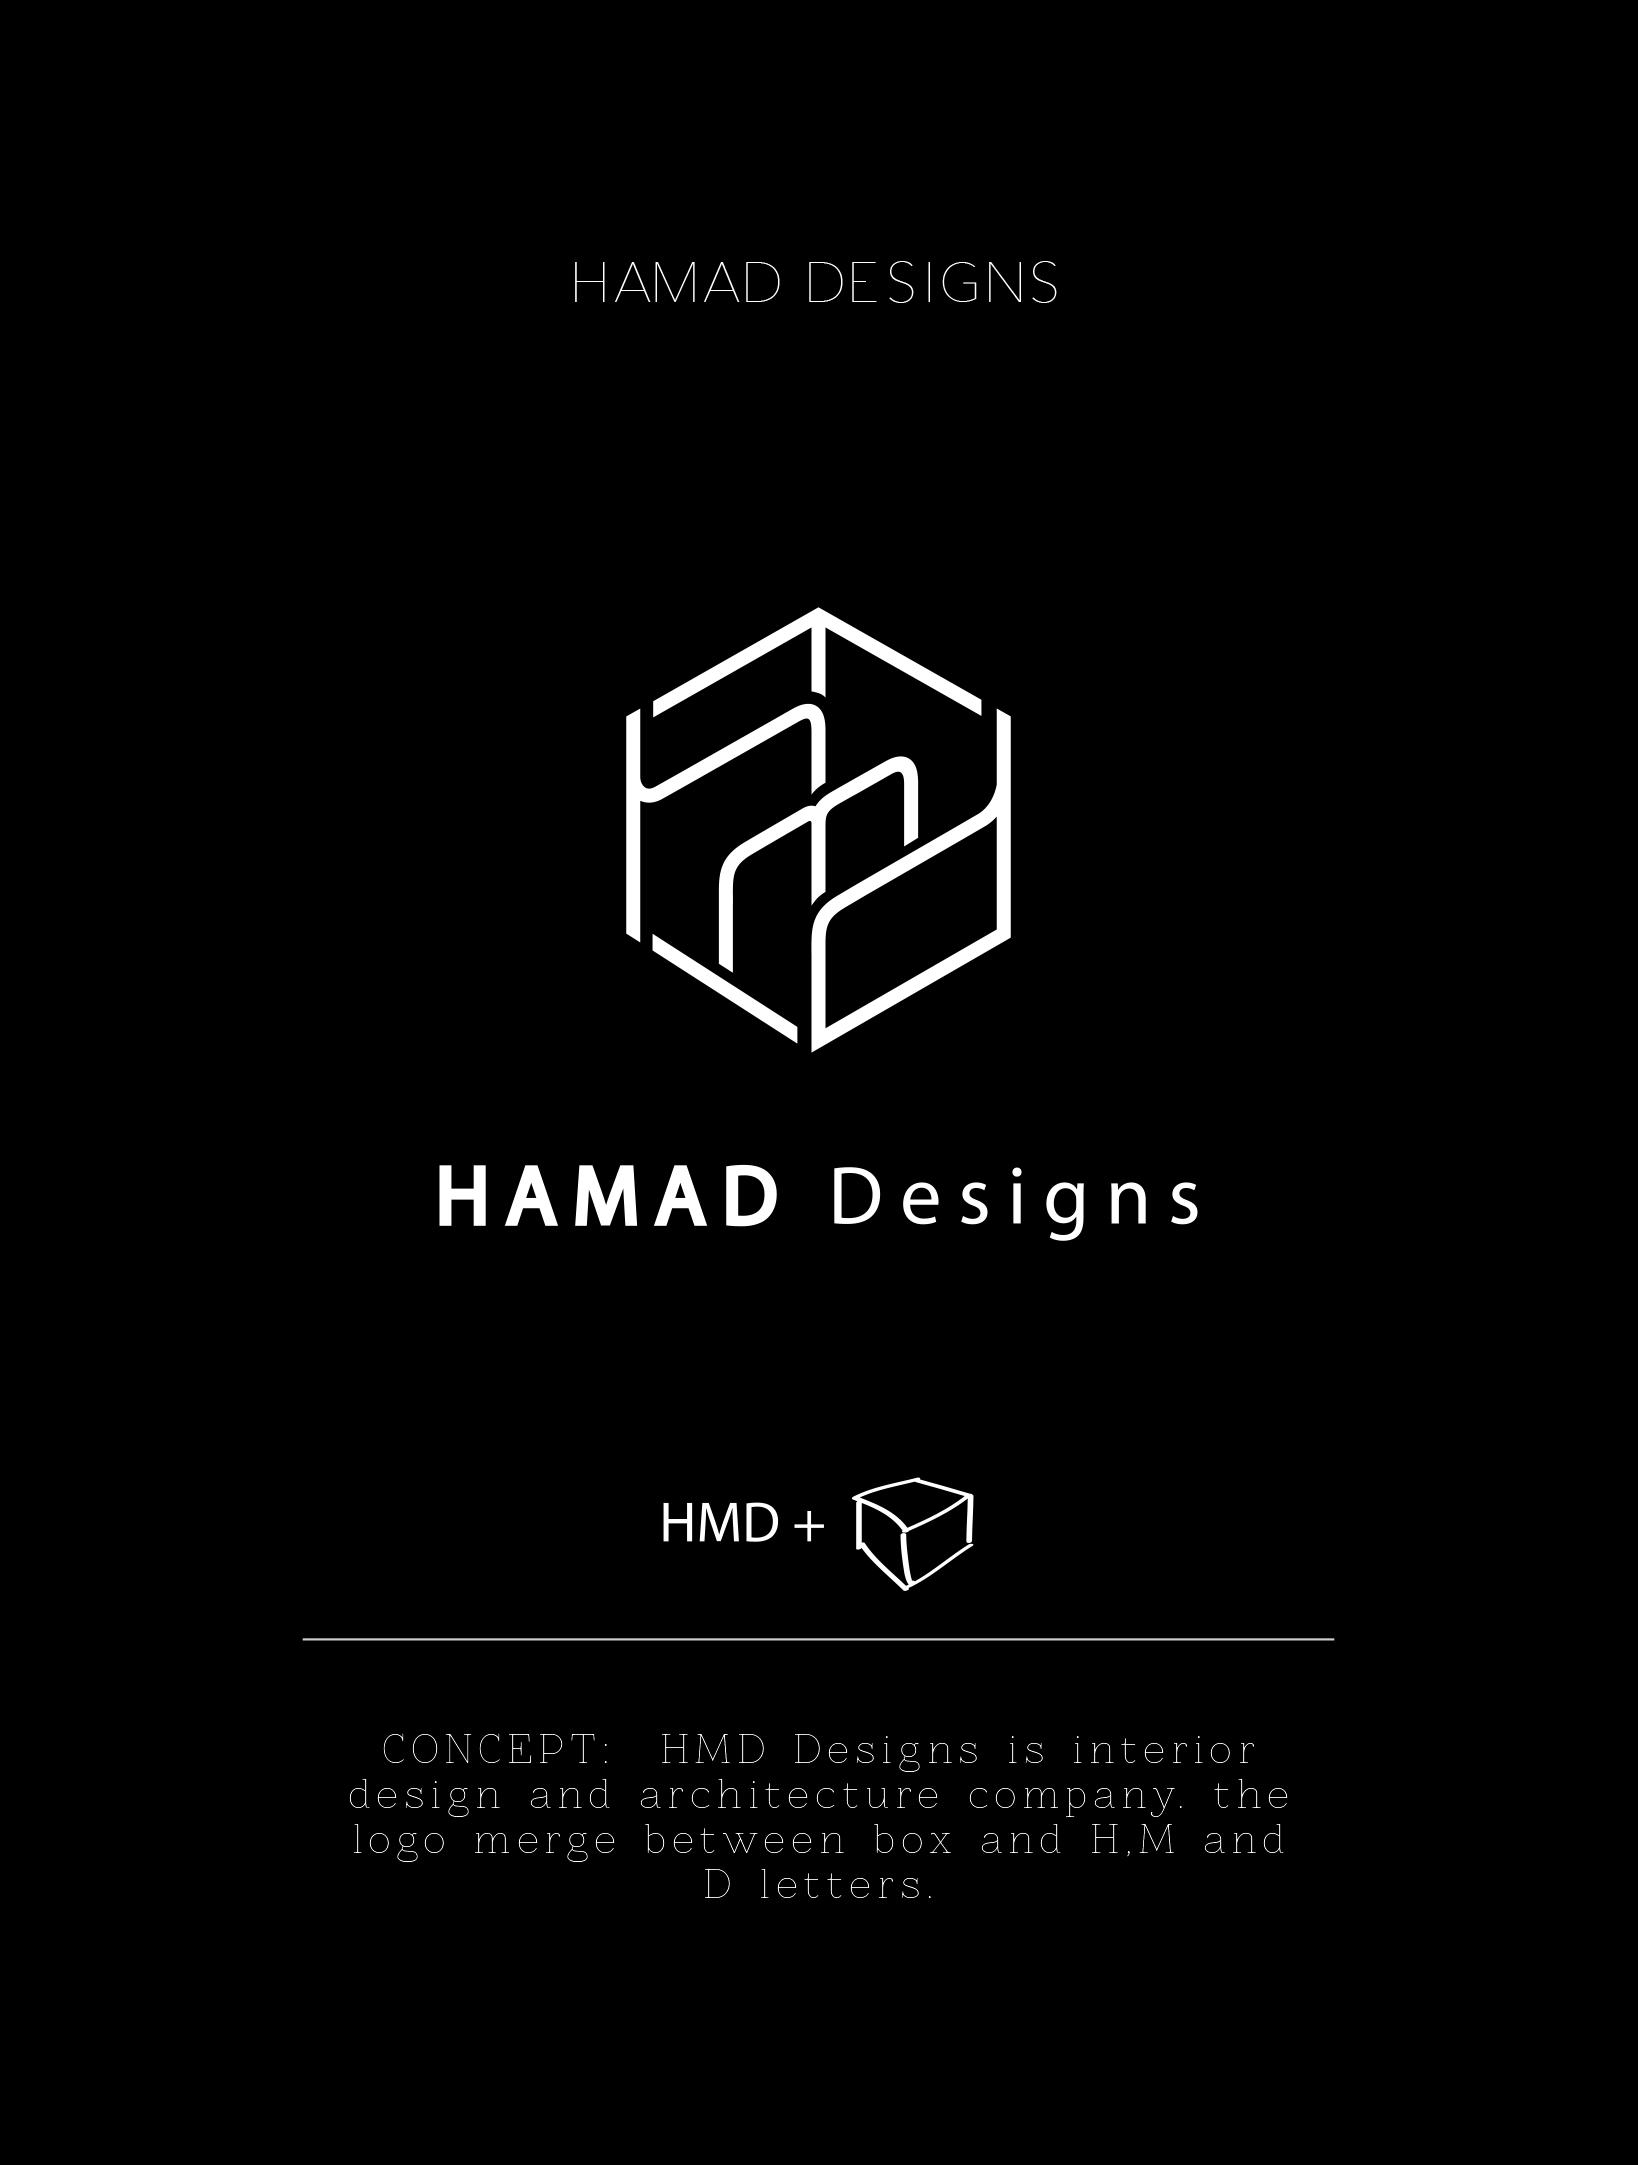 interior design logo ideas. HAMAD DESIGNS CONCEPT  HMD Designs is interior design and architecture company the logo merge